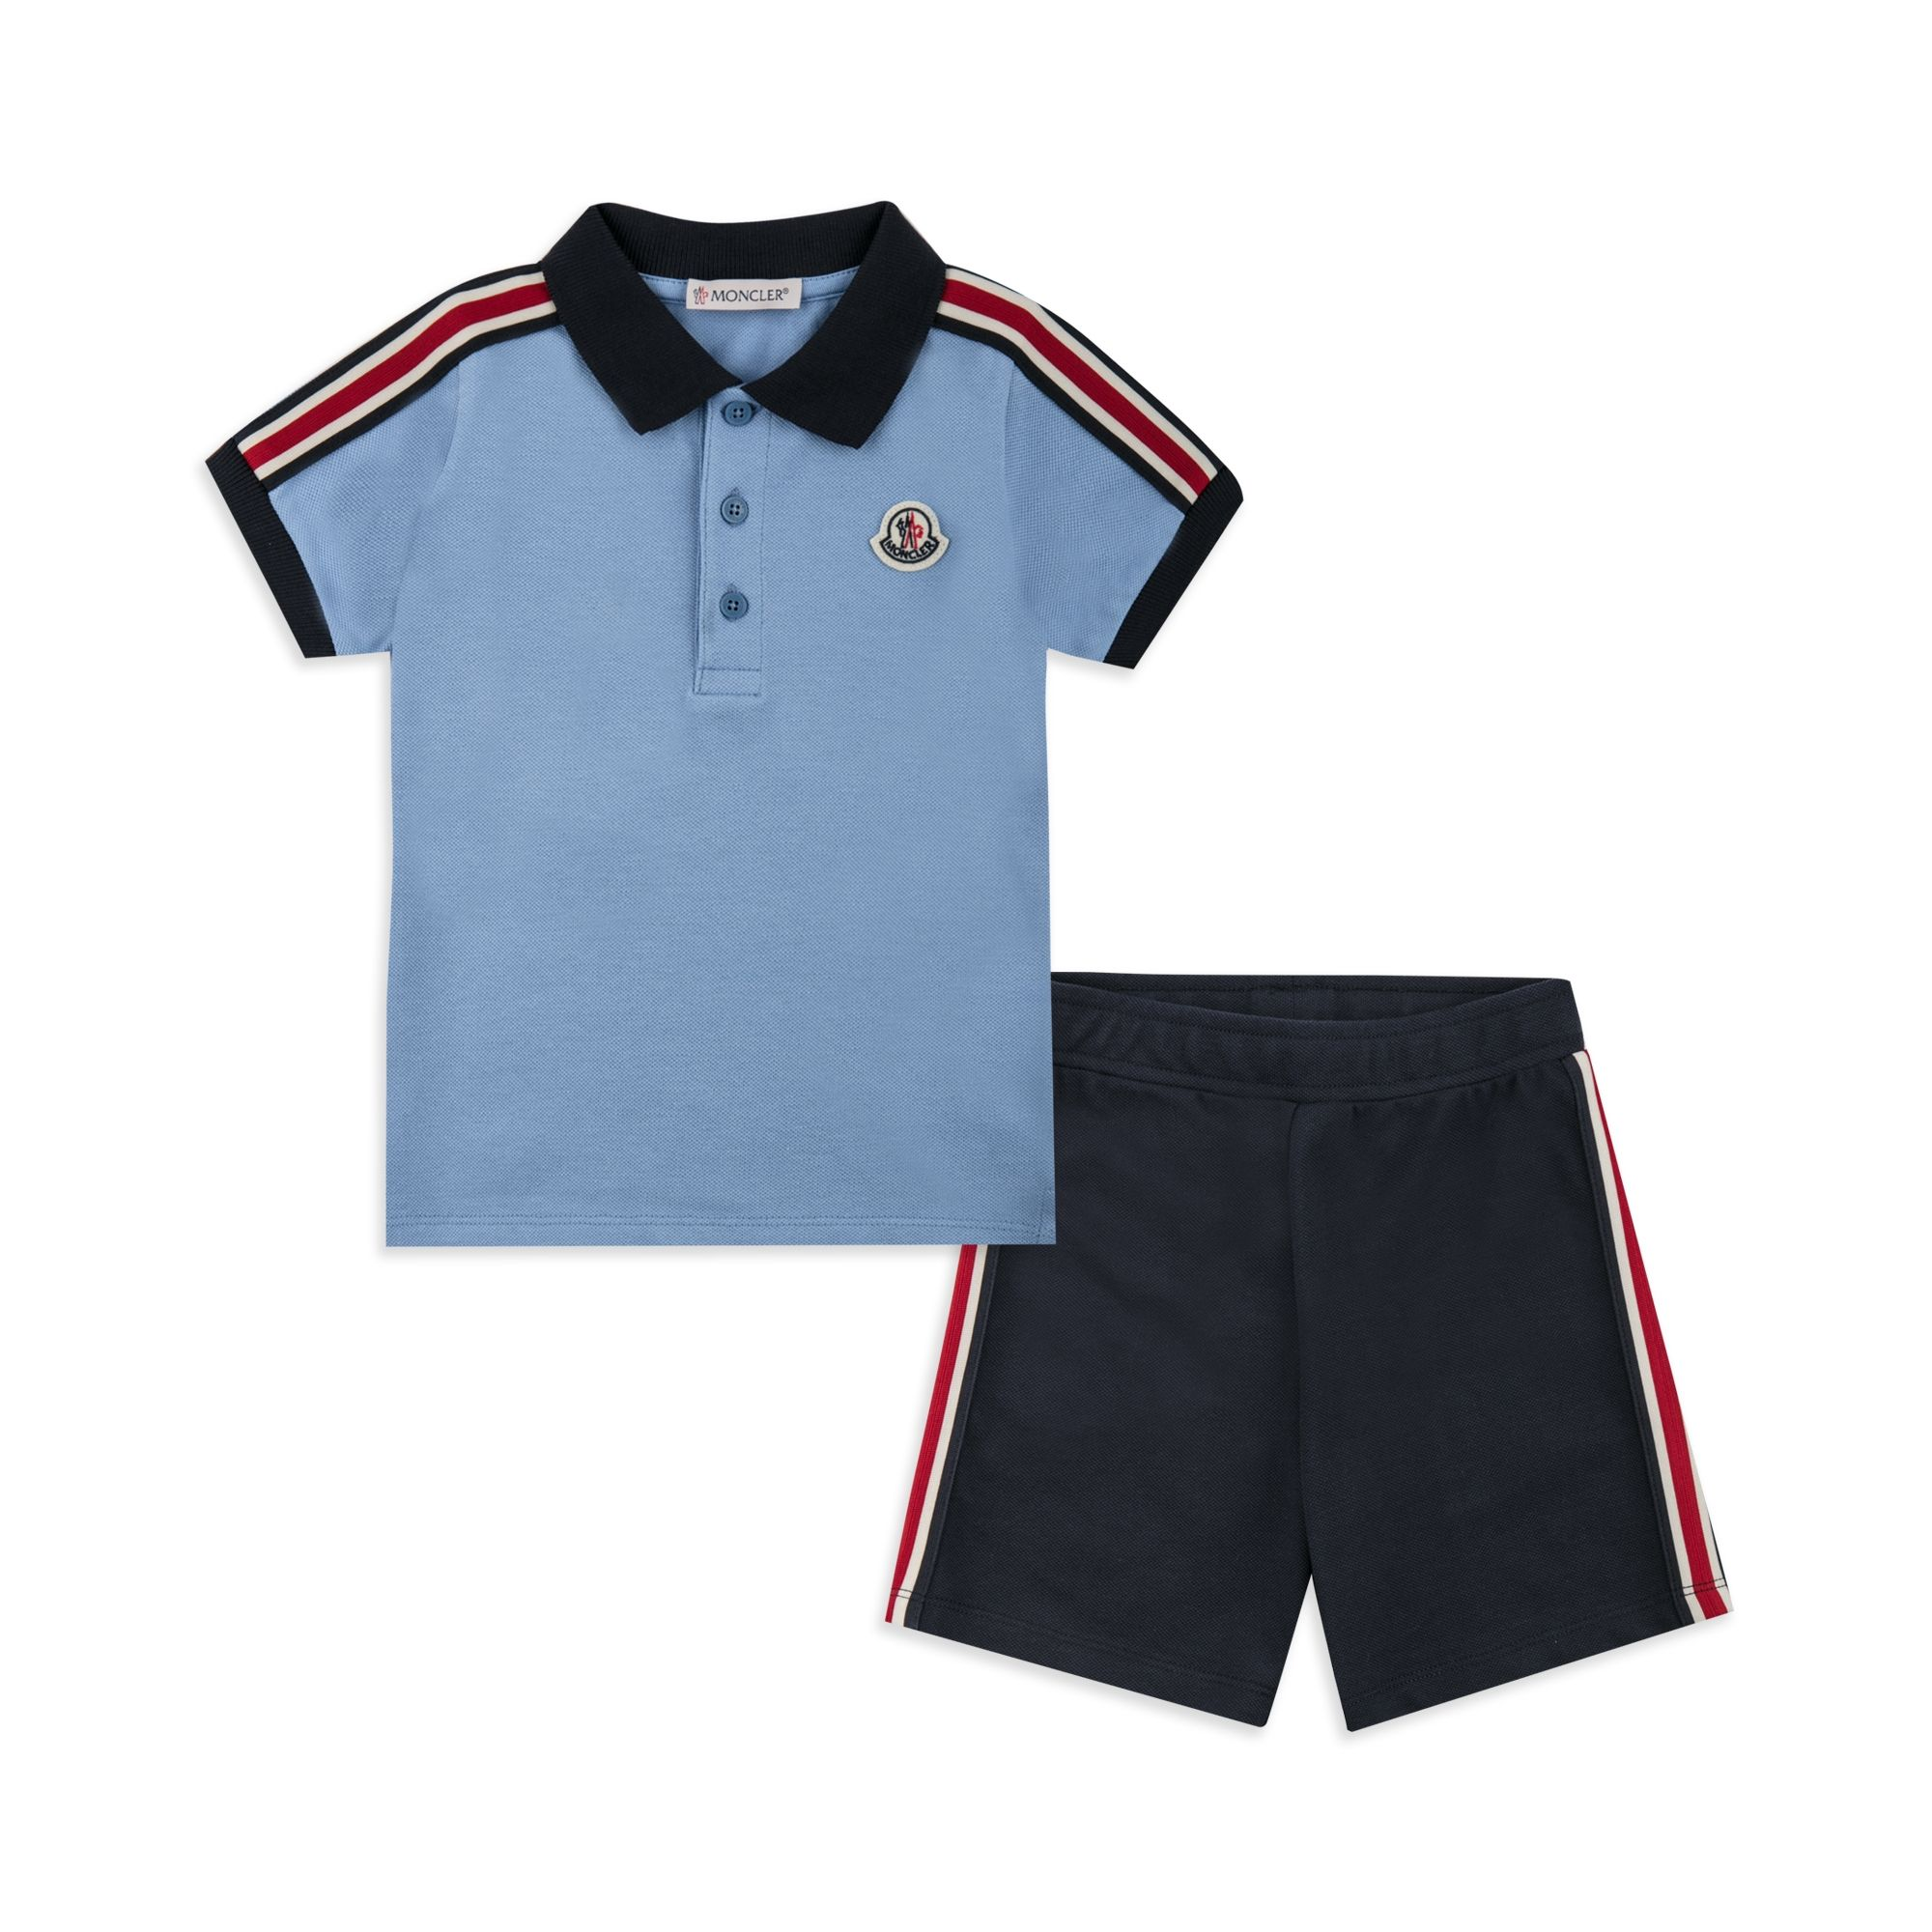 5776b9443 Baby Boys Striped Polo Outfit Set - Blue | base Moncler SS18 | Polo ...